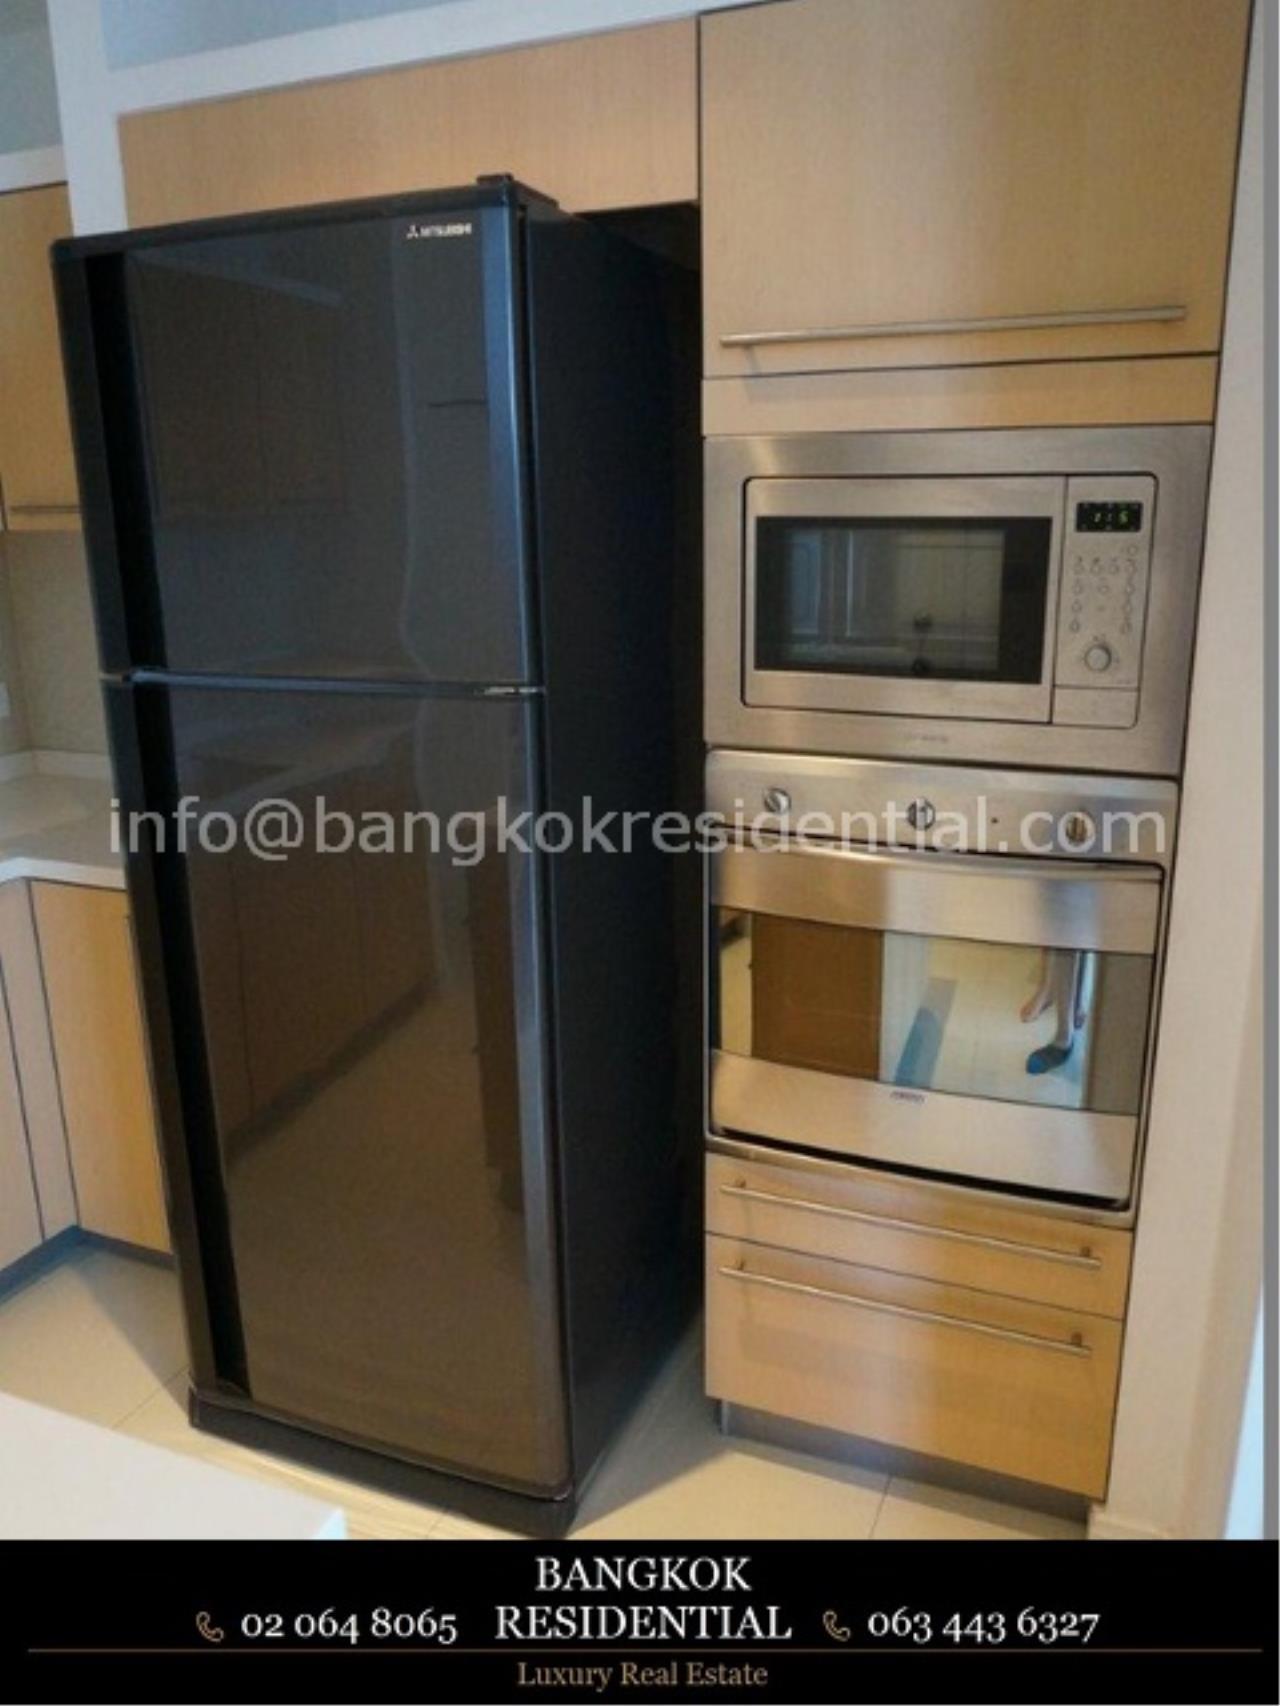 Bangkok Residential Agency's 3BR Athenee Residence For Sale Or Rent (BR3386CD) 6